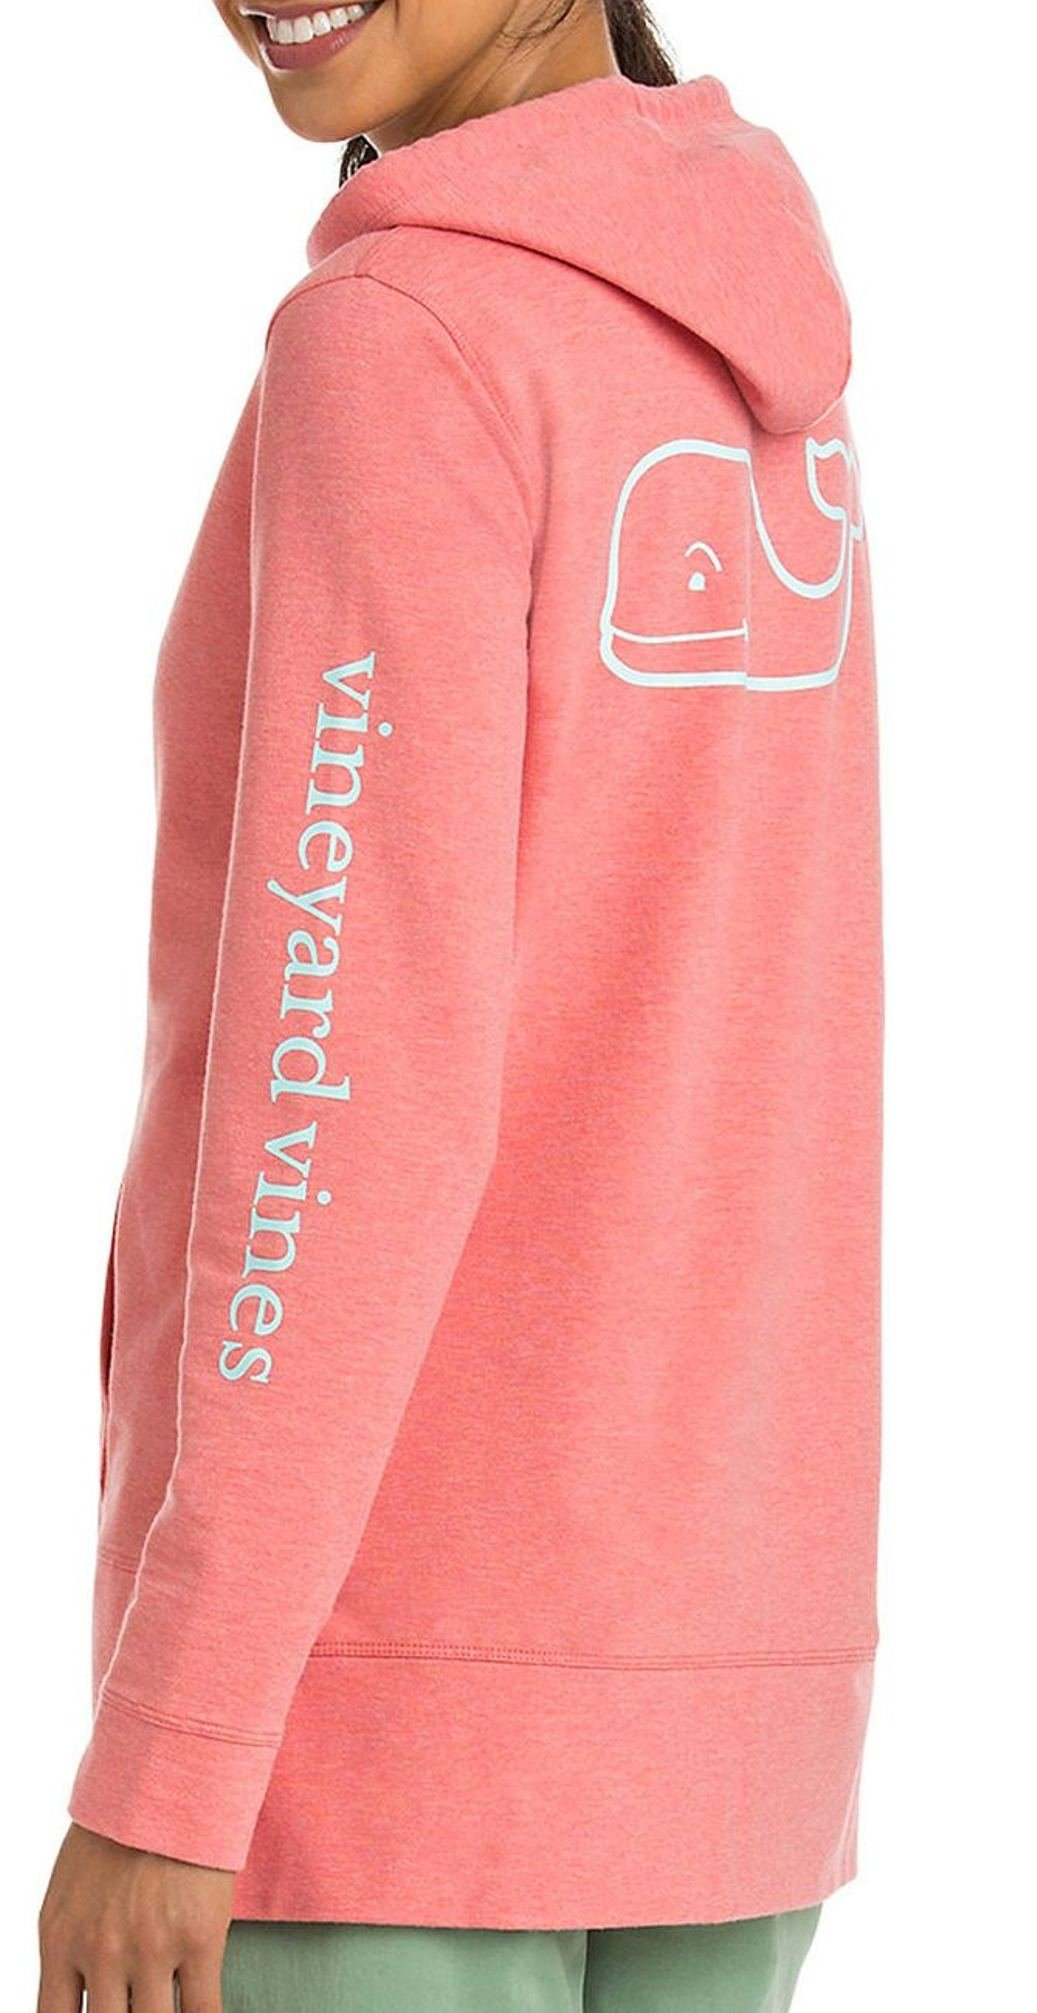 Vineyard Vines Womens LS Whale French Terry Hoodie Sweatshirt 2K1118-662 Blush (Small)